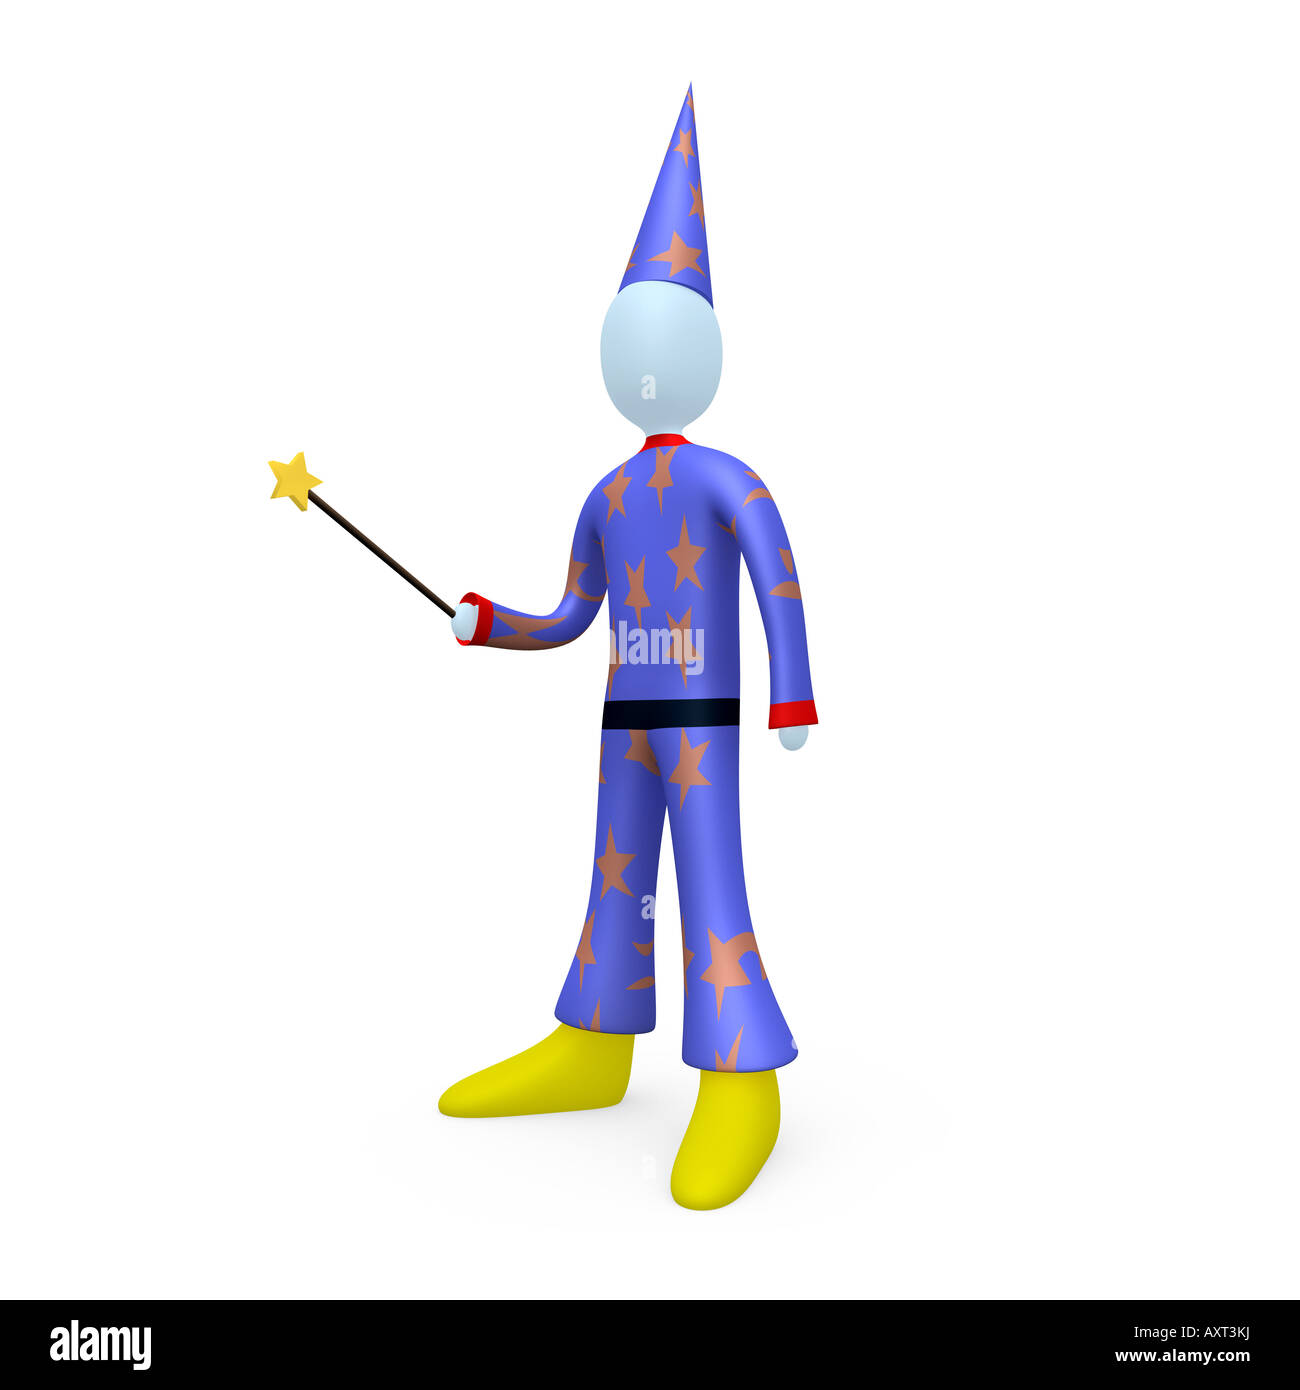 Wizard - Stock Image